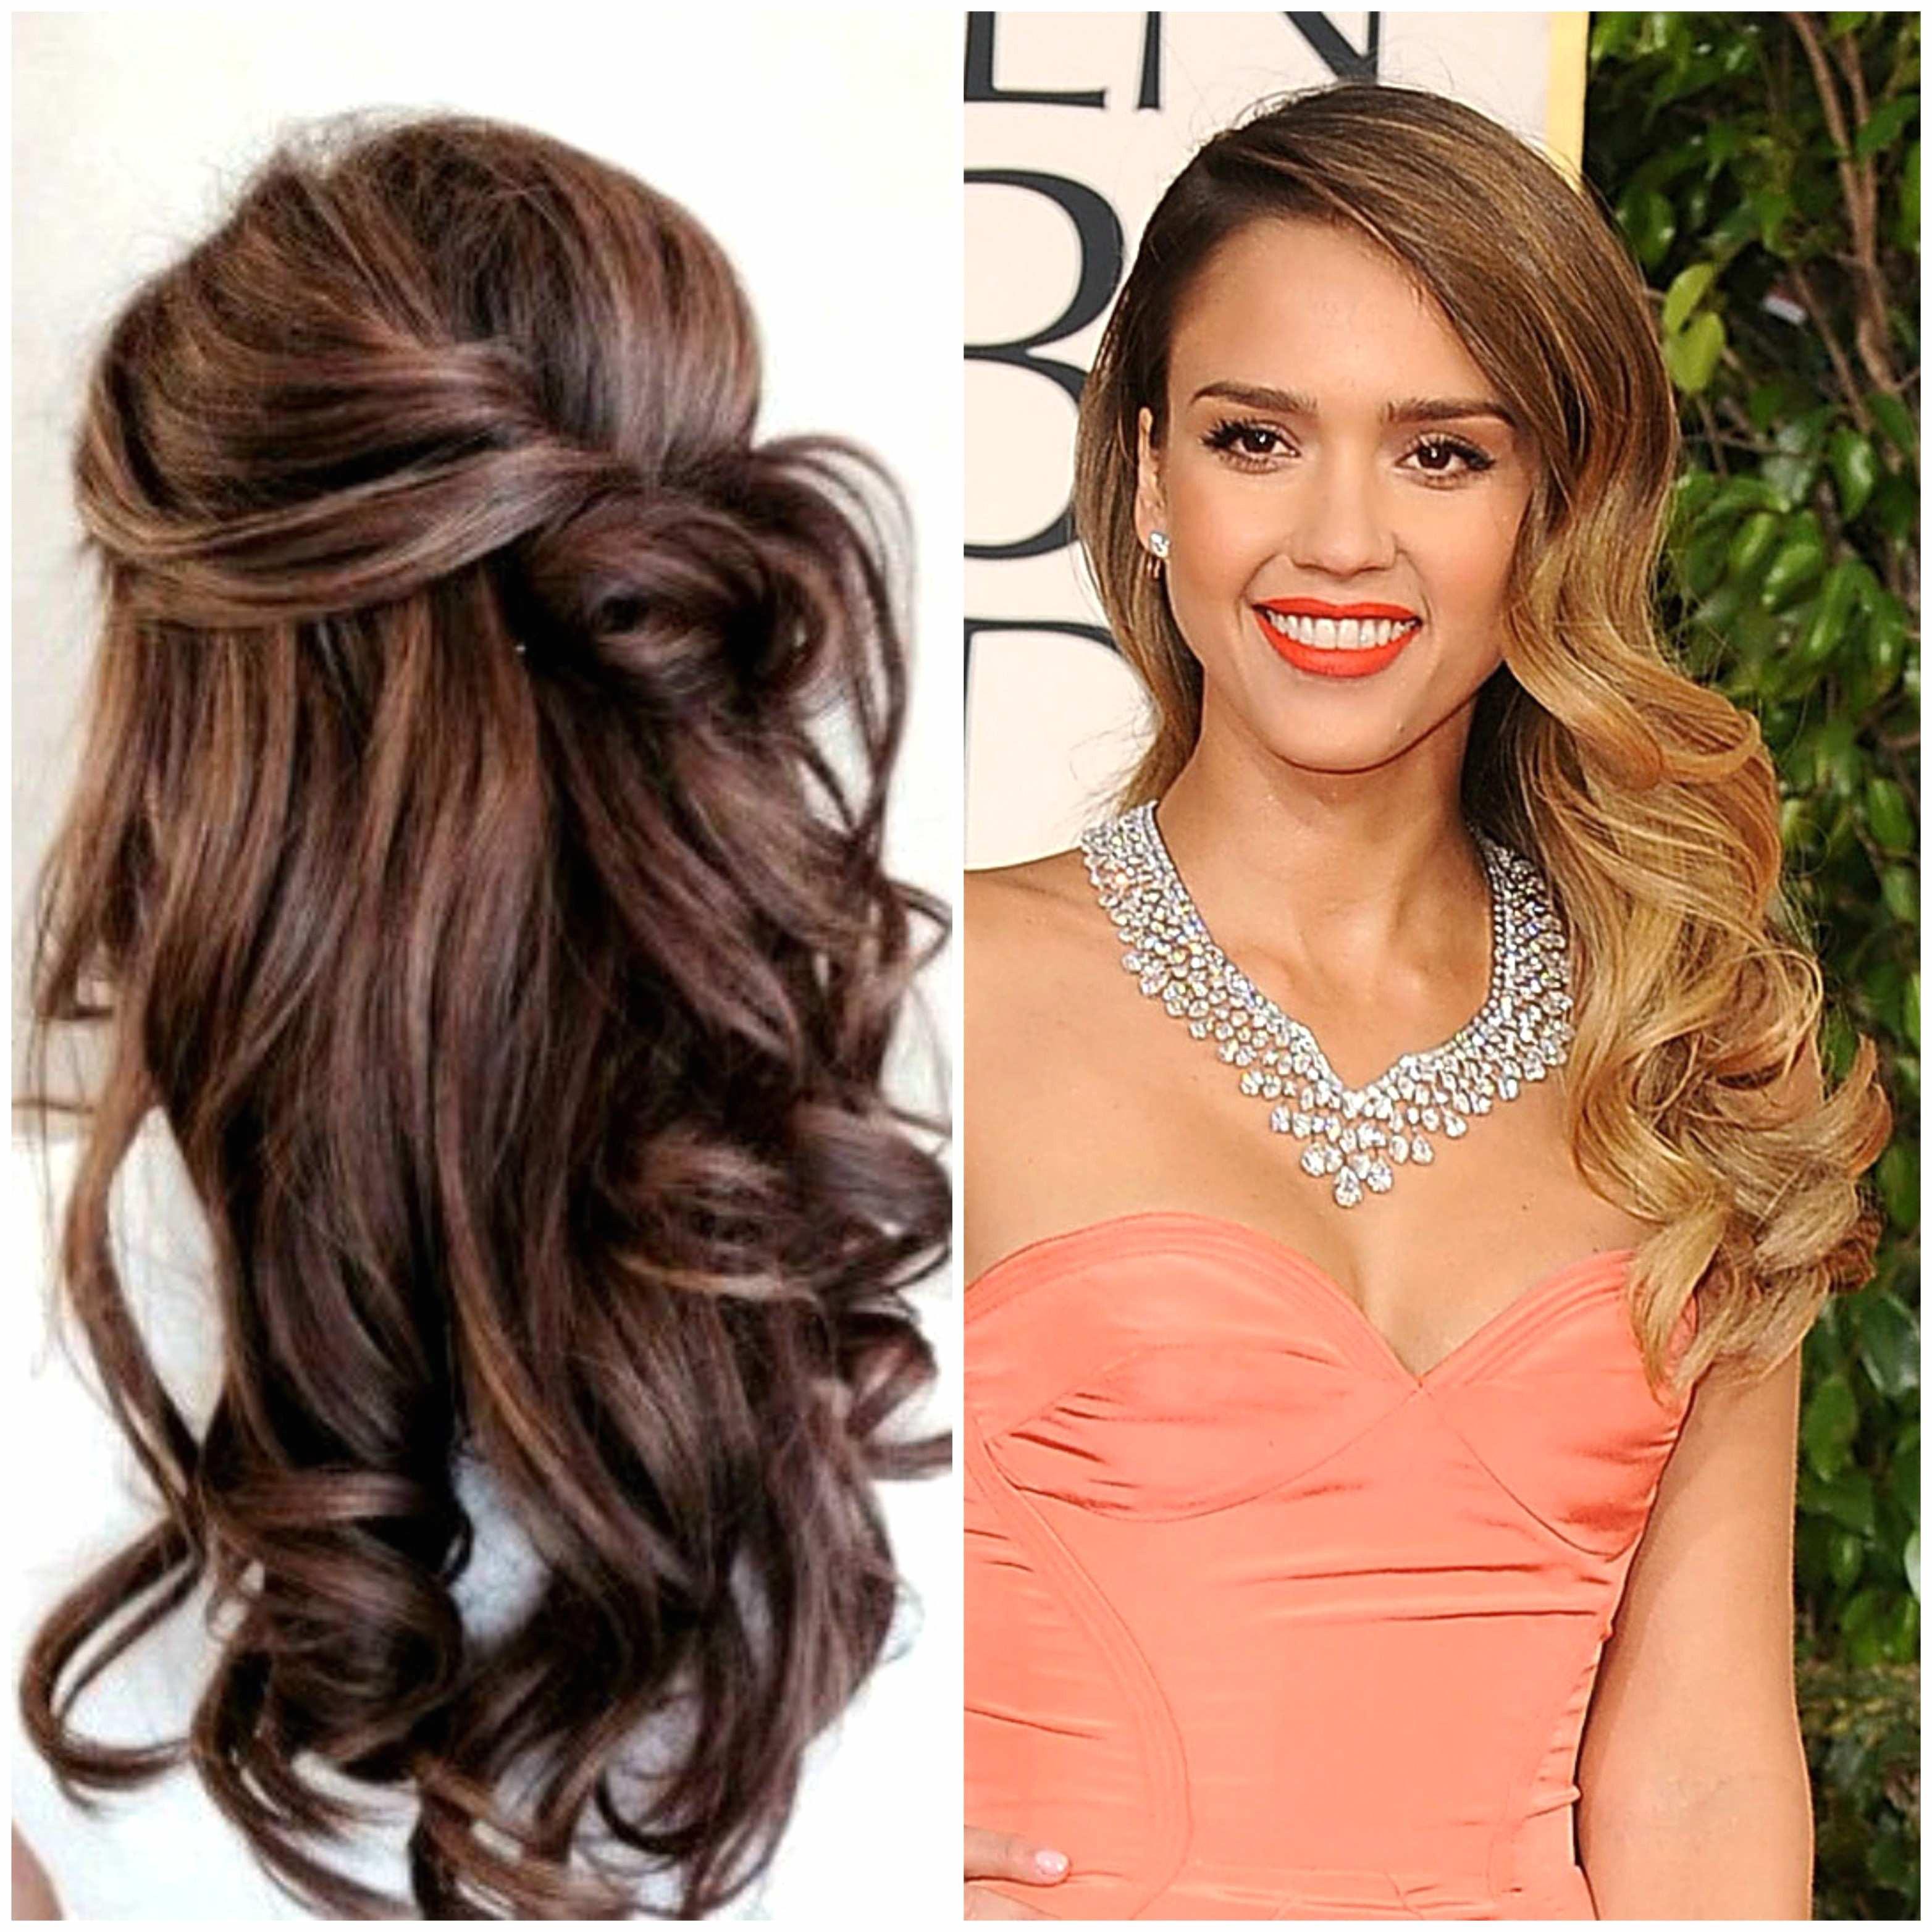 Little Girl Hairstyles In Braids Elegant Cute Little Black Girl Hairstyles Image Luxury Lovely New Dreads